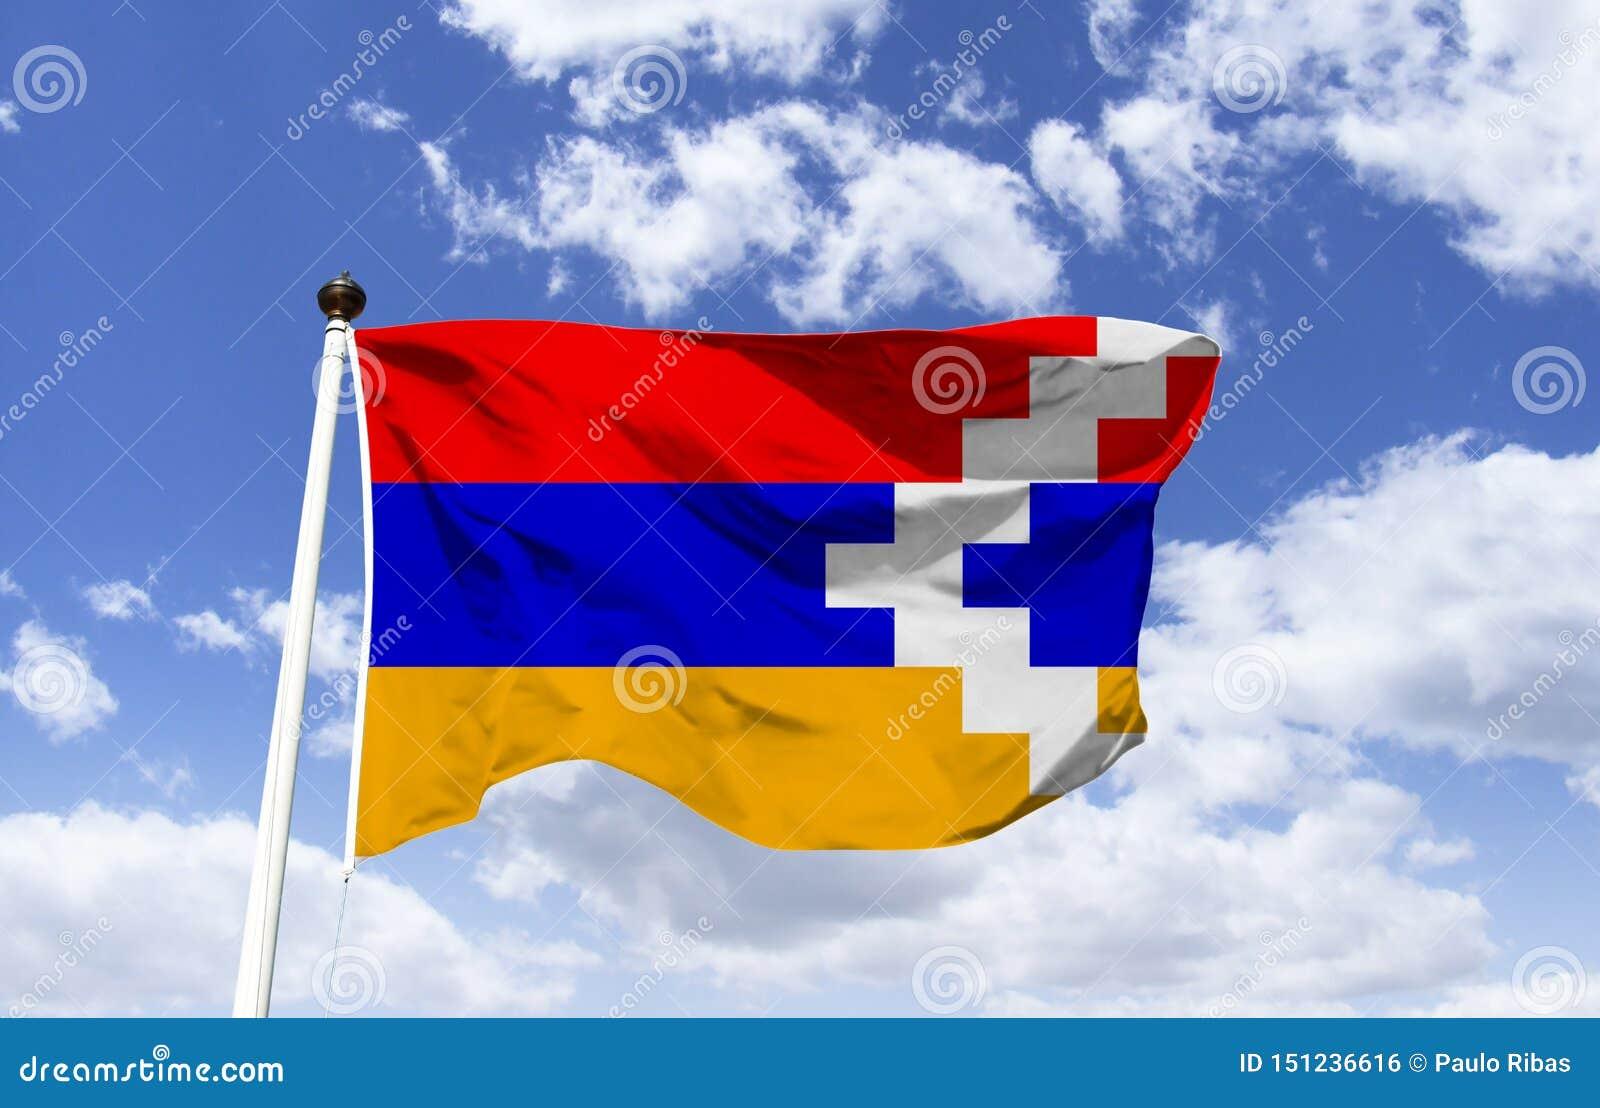 A bandeira da república de Artsakh, Artsaque, deriva-se da bandeira de Armênia